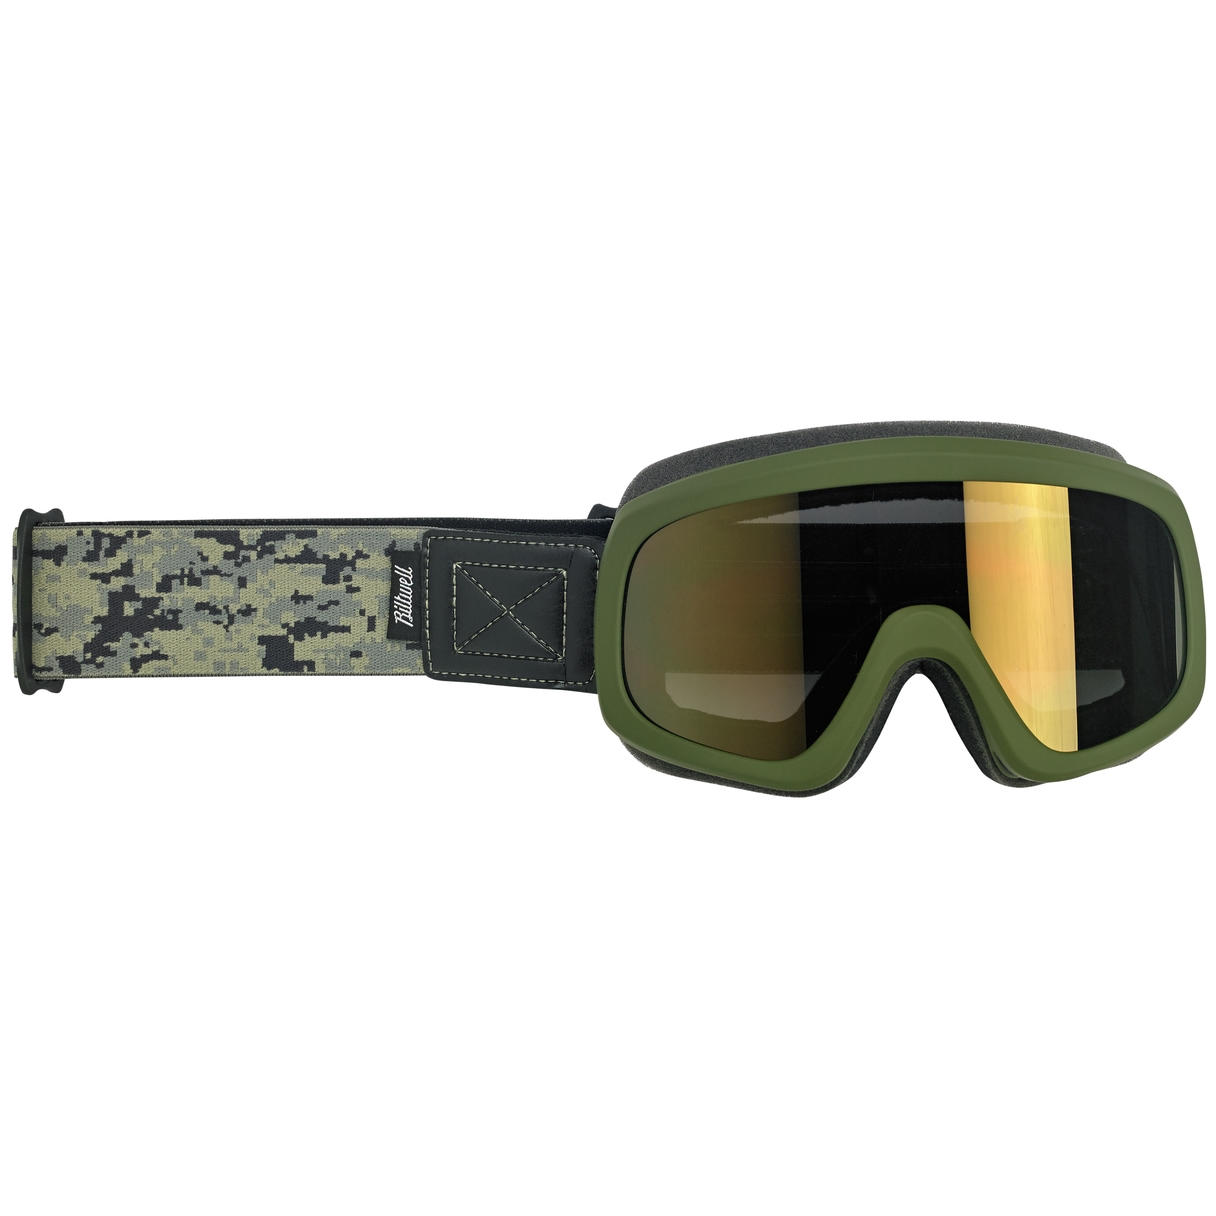 Biltwell Overland 2.0 Goggle, Grunt Olive